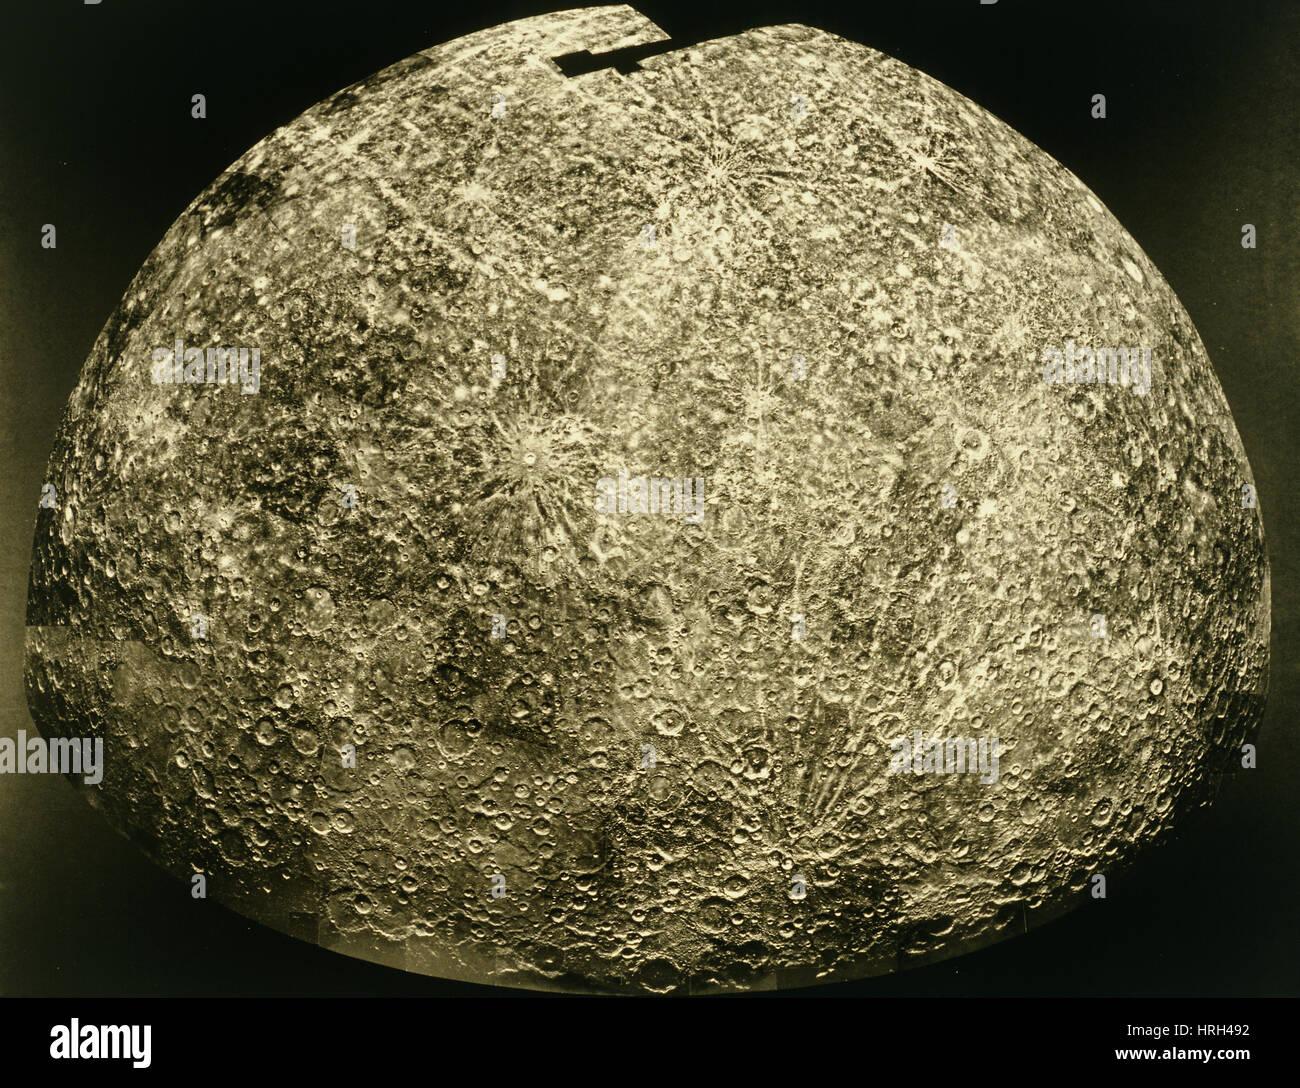 Mercury, Mariner 10 Image - Stock Image